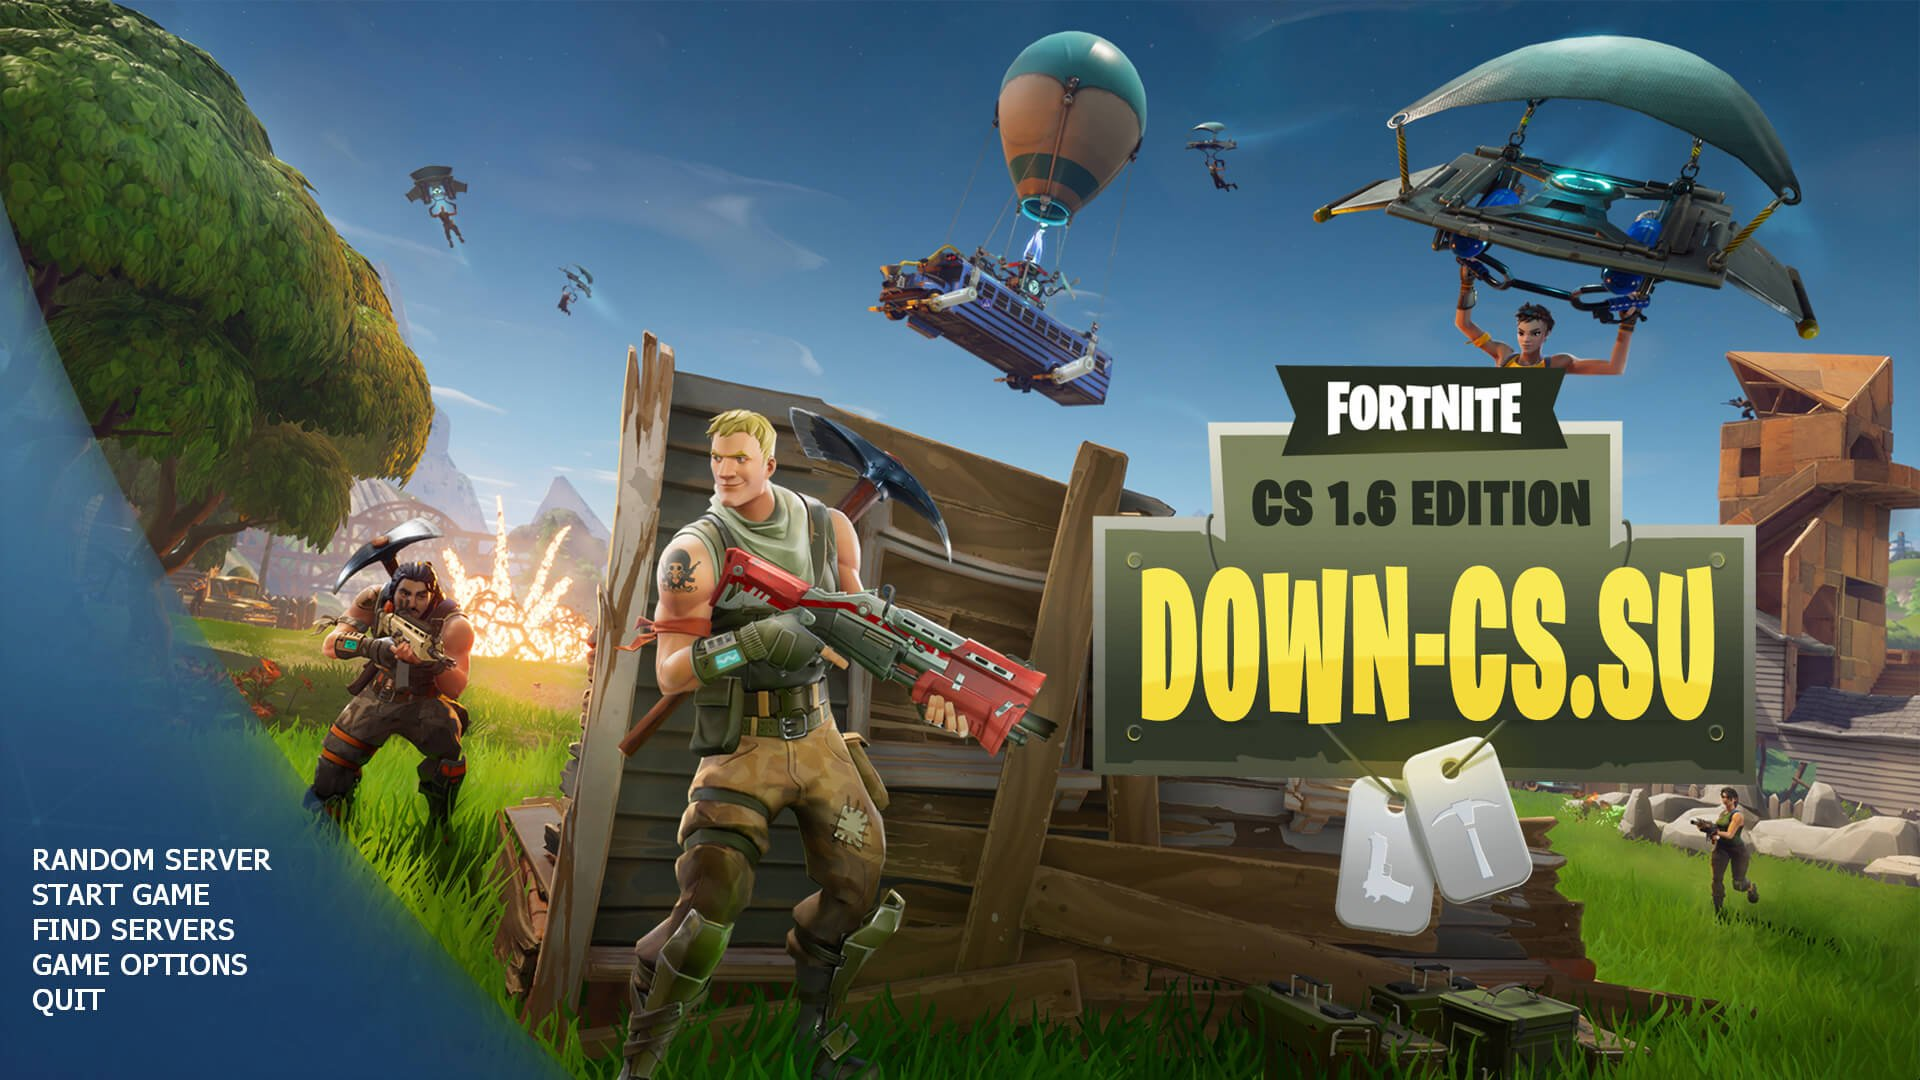 Download CS 1.6 Fortnite Edition